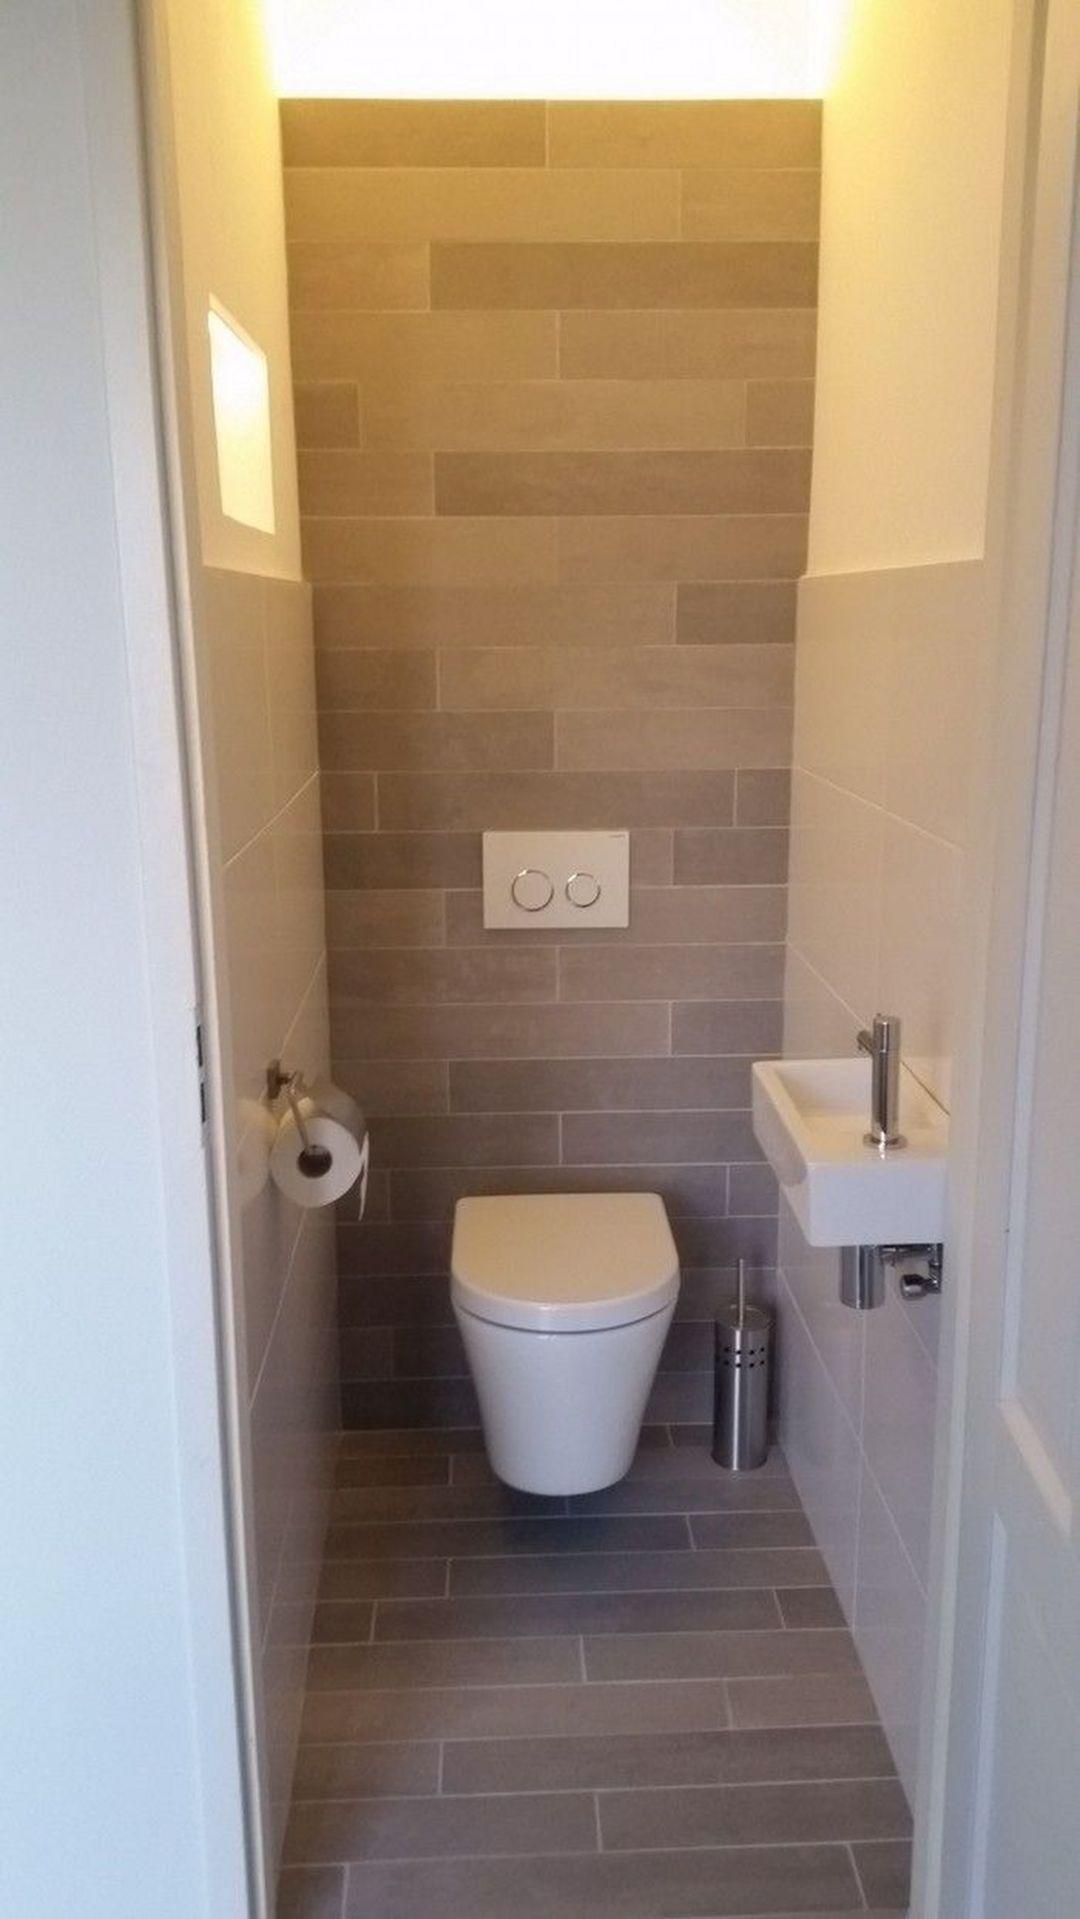 Toilet Small Bathroom Ideas Toiletdesignforsmallhouse Small